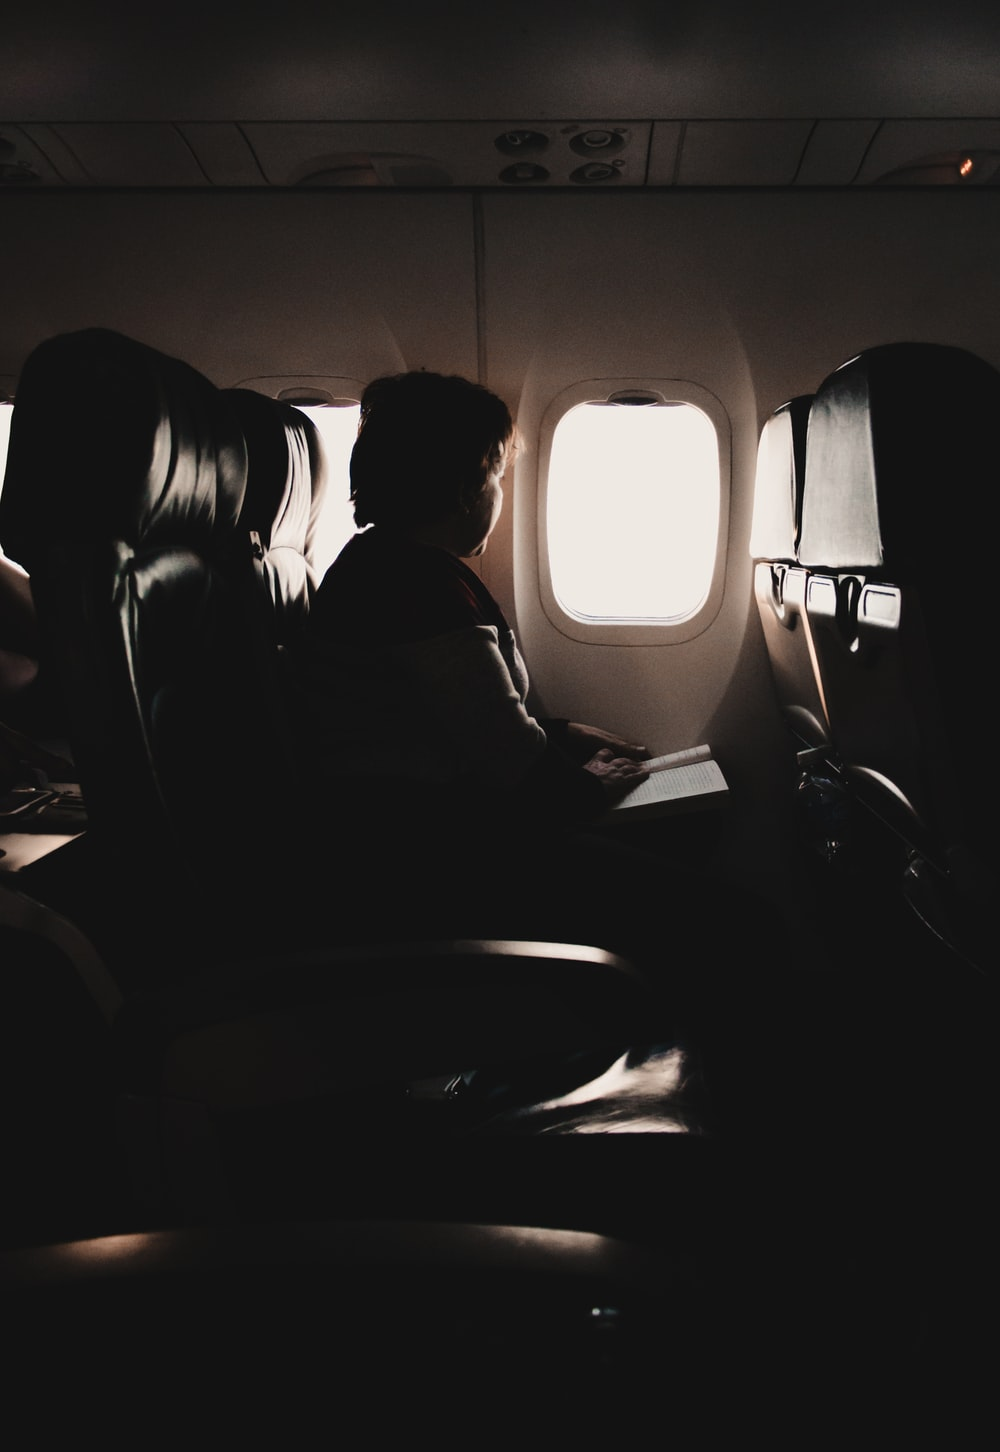 person riding plane